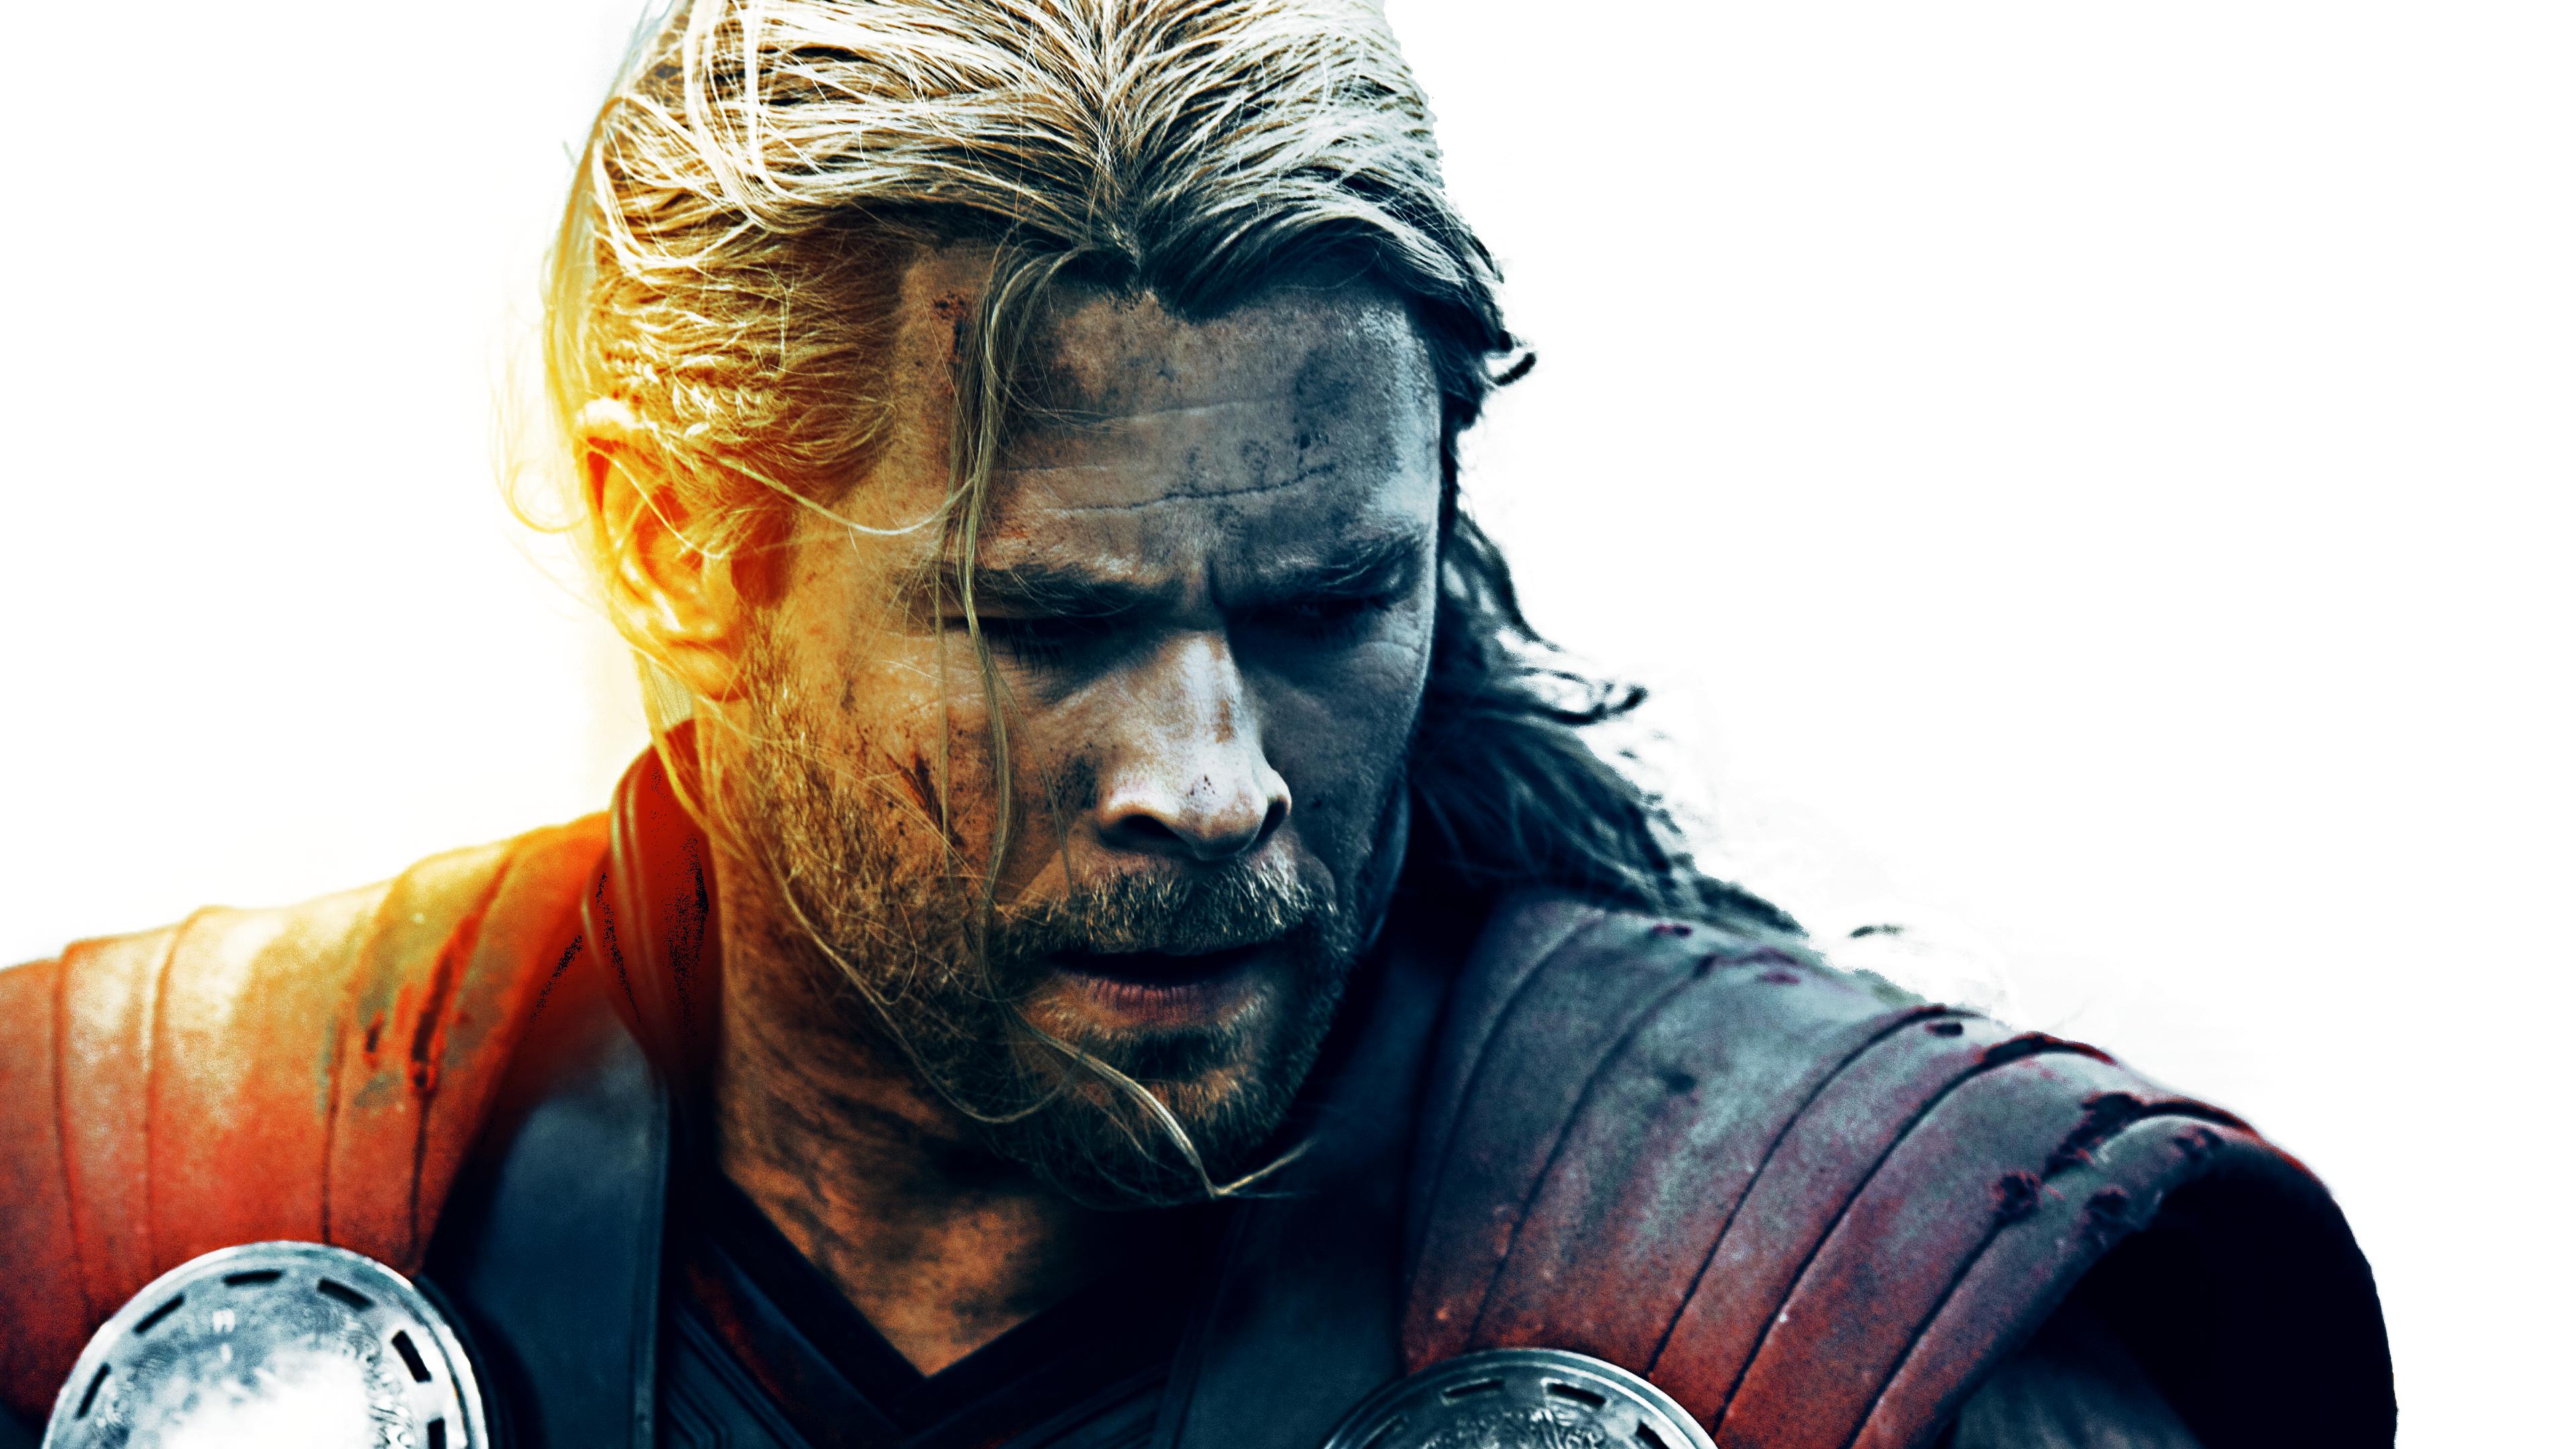 Thor Ragnarok Hd Wallpaper Download Free Hd Wallpapers